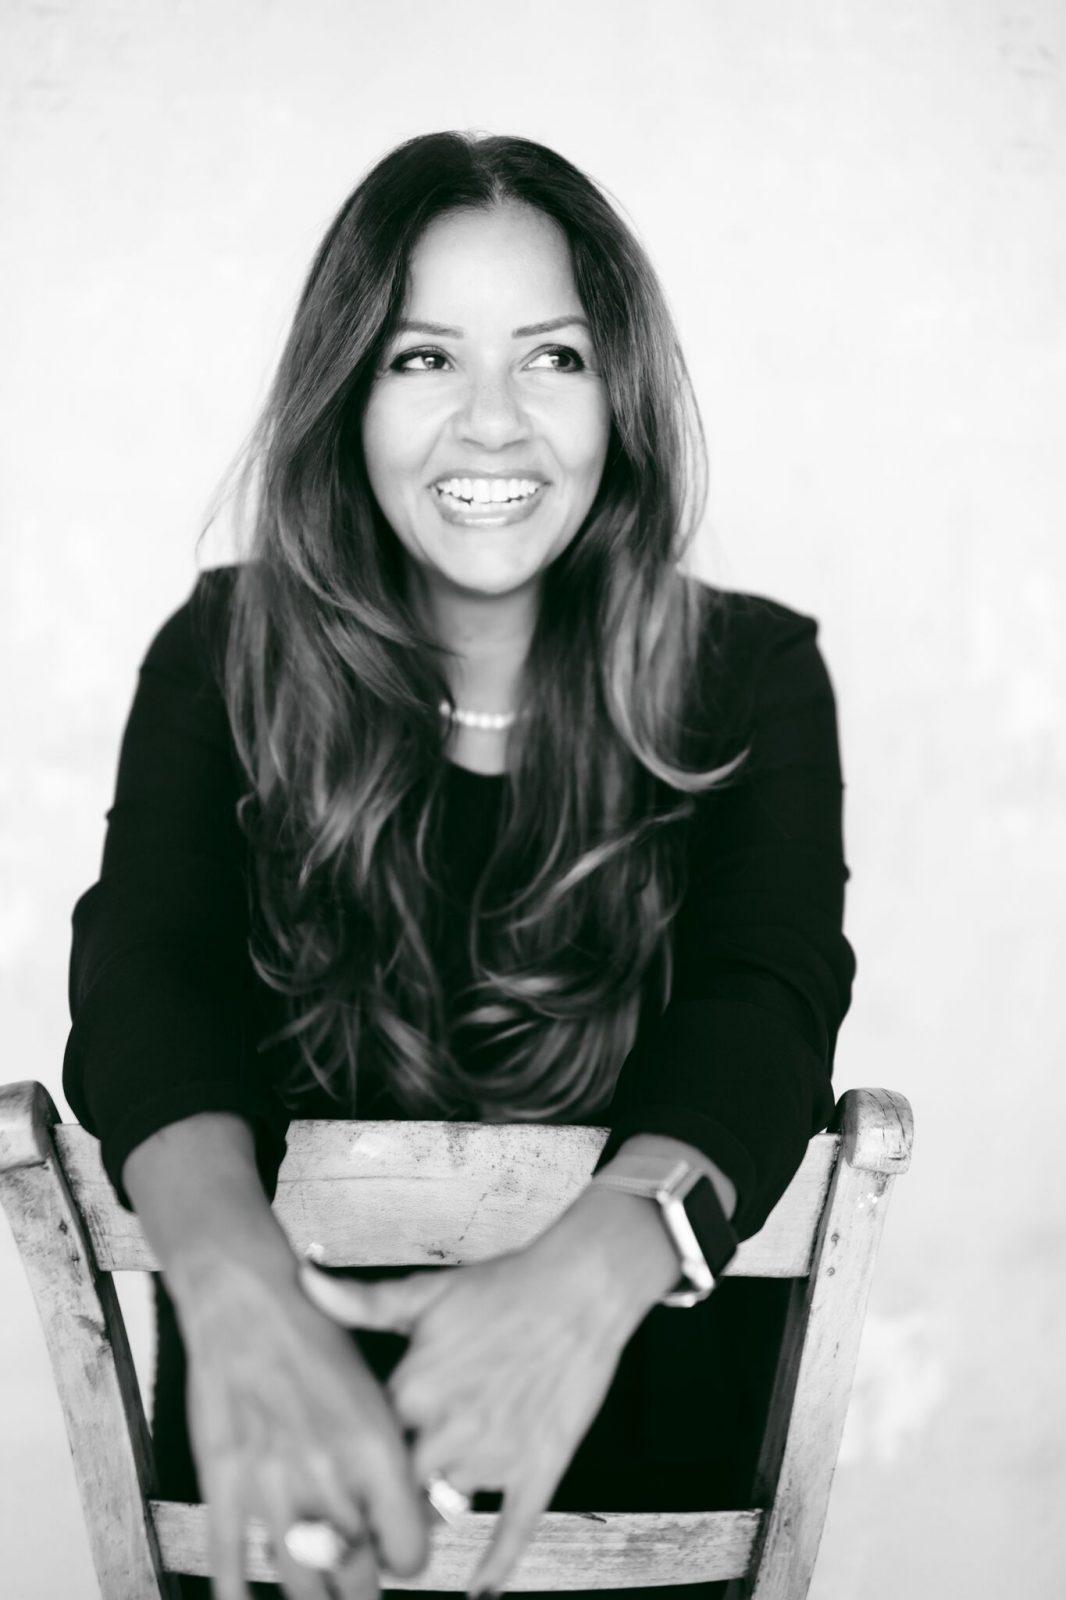 The Organic Glow Beauty Lounge's Founder Leena Al Abbas